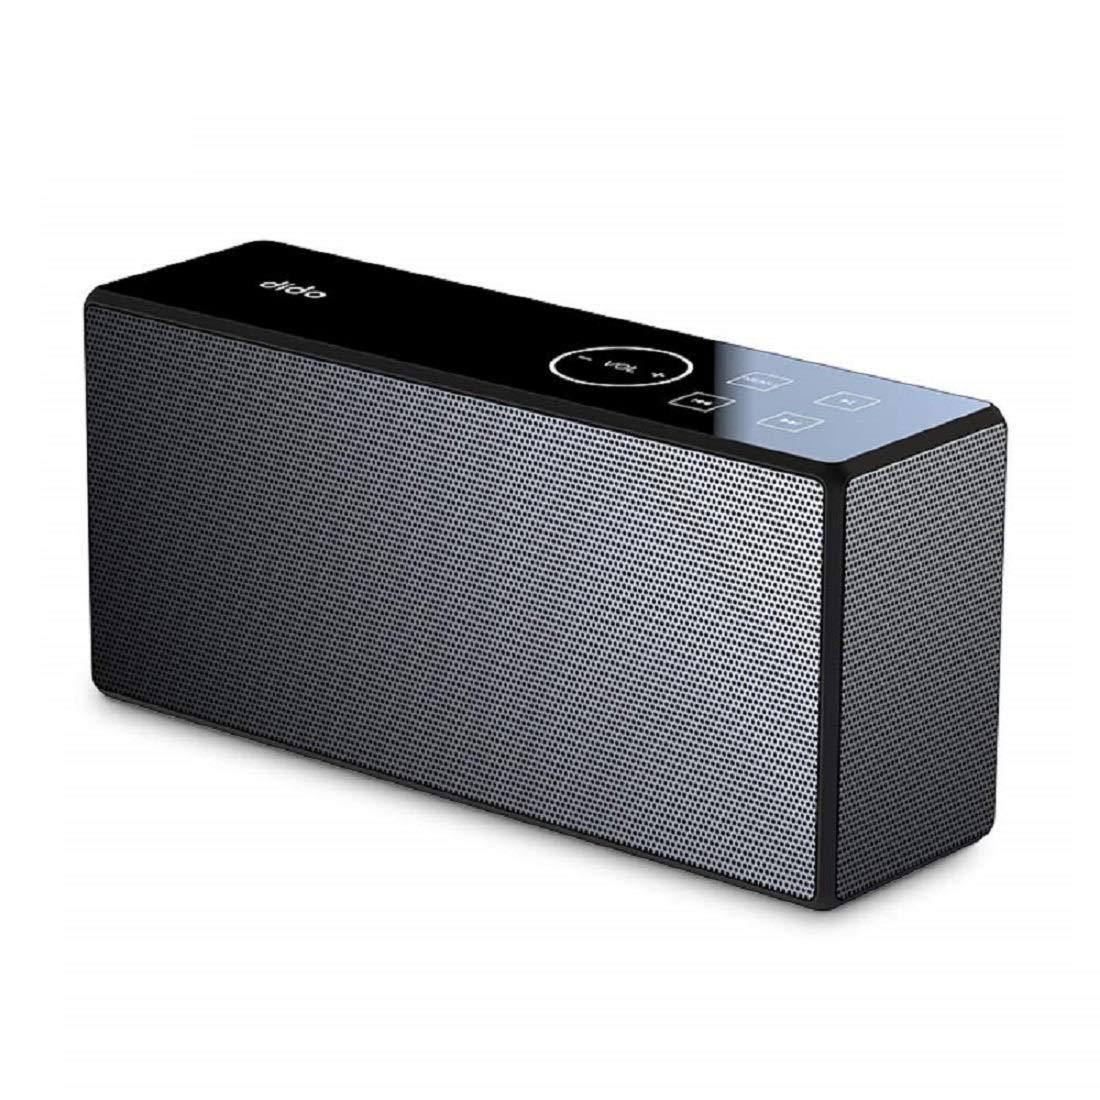 VINCEN Bluetoothスピーカー ホームミニサウンド TF FM AUX 充電 ラジオ コール リモートコントロール スマートスピーカー B07JWDZBVP